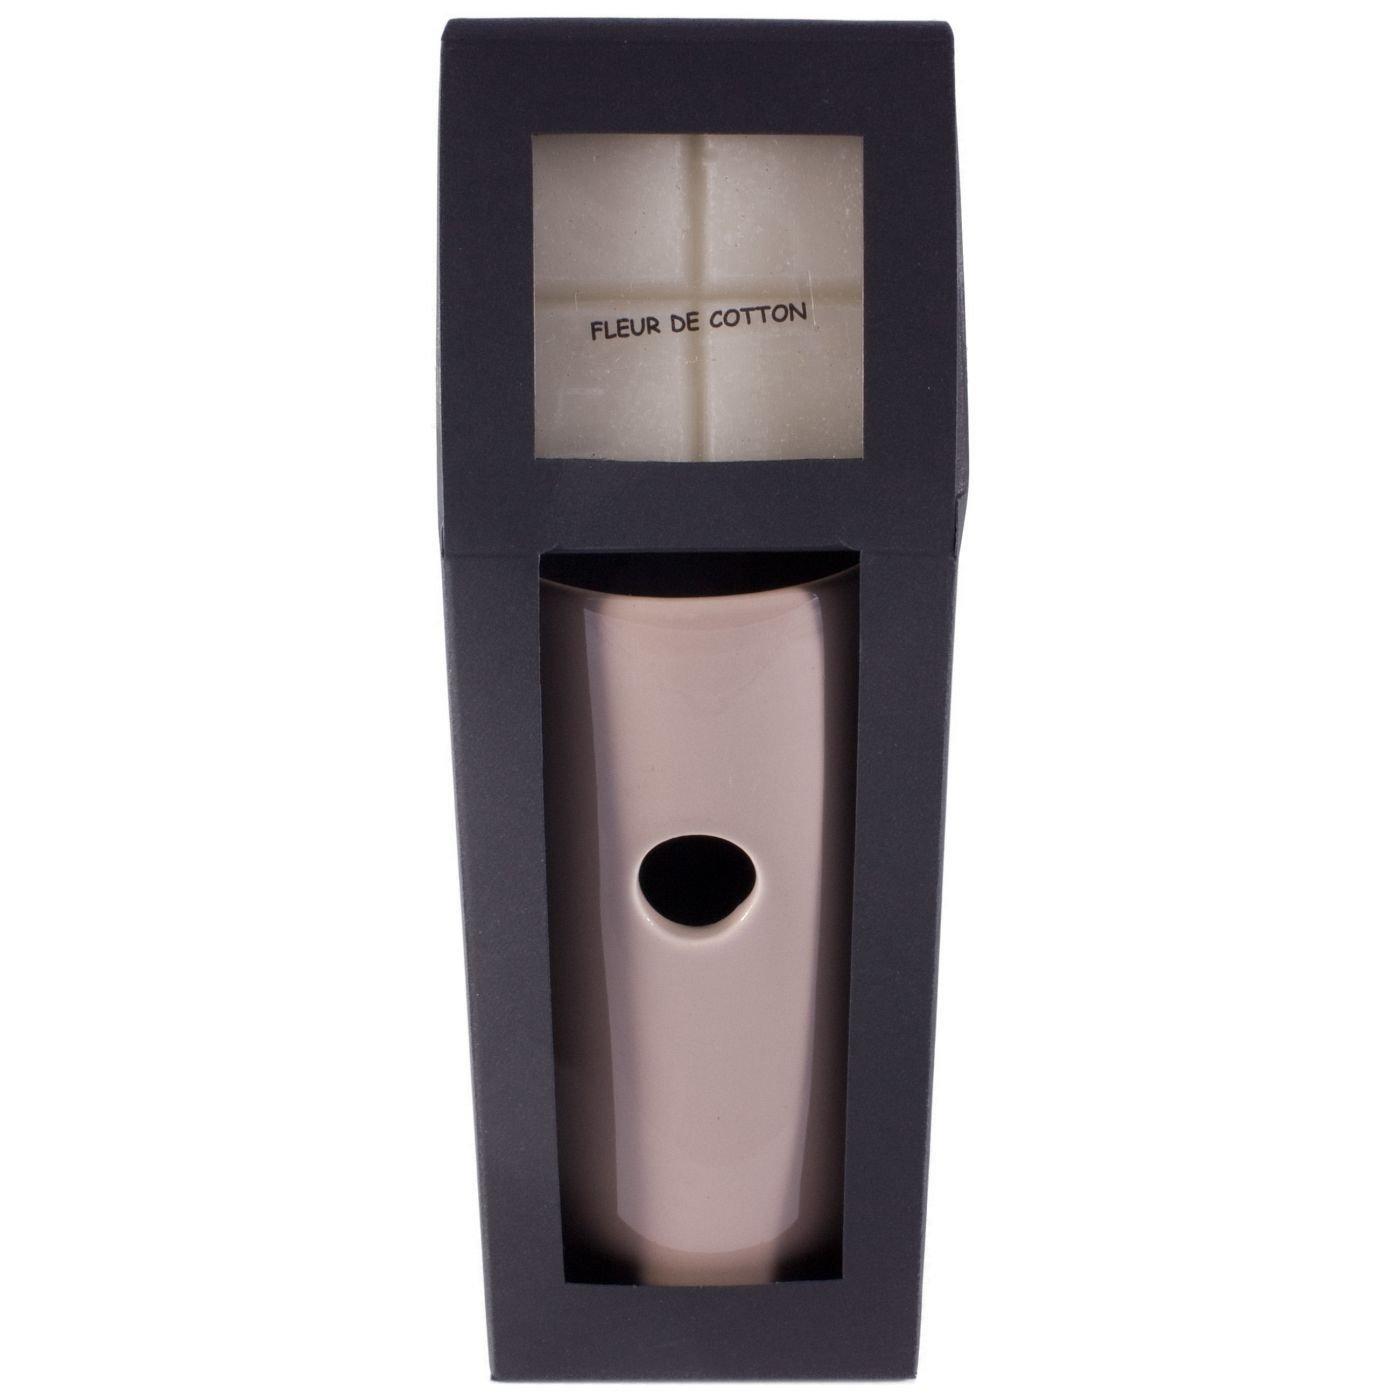 Drake Ceramic Home Fragrance Wax Melt Burner Tube Taupe with Pack of Melts